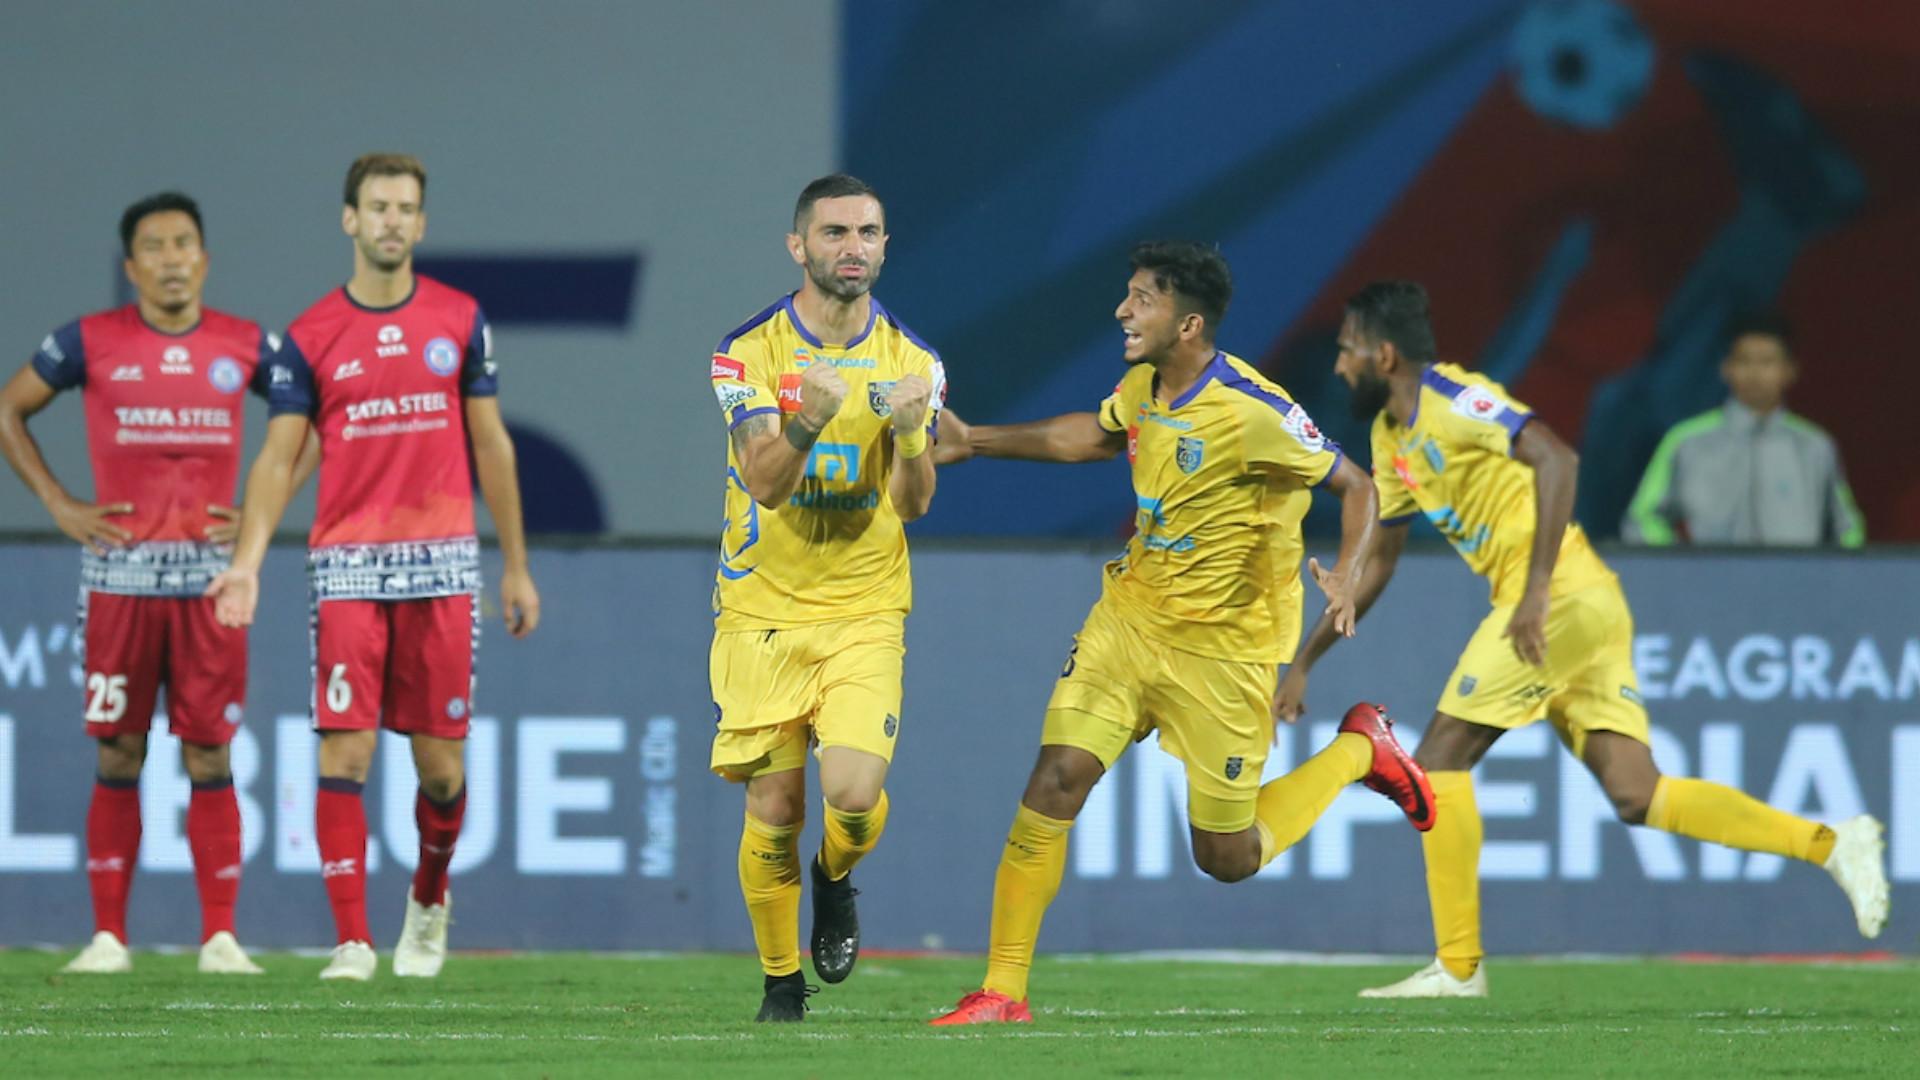 Jamshedpur vs Kerala Blasters ISL 2018-19